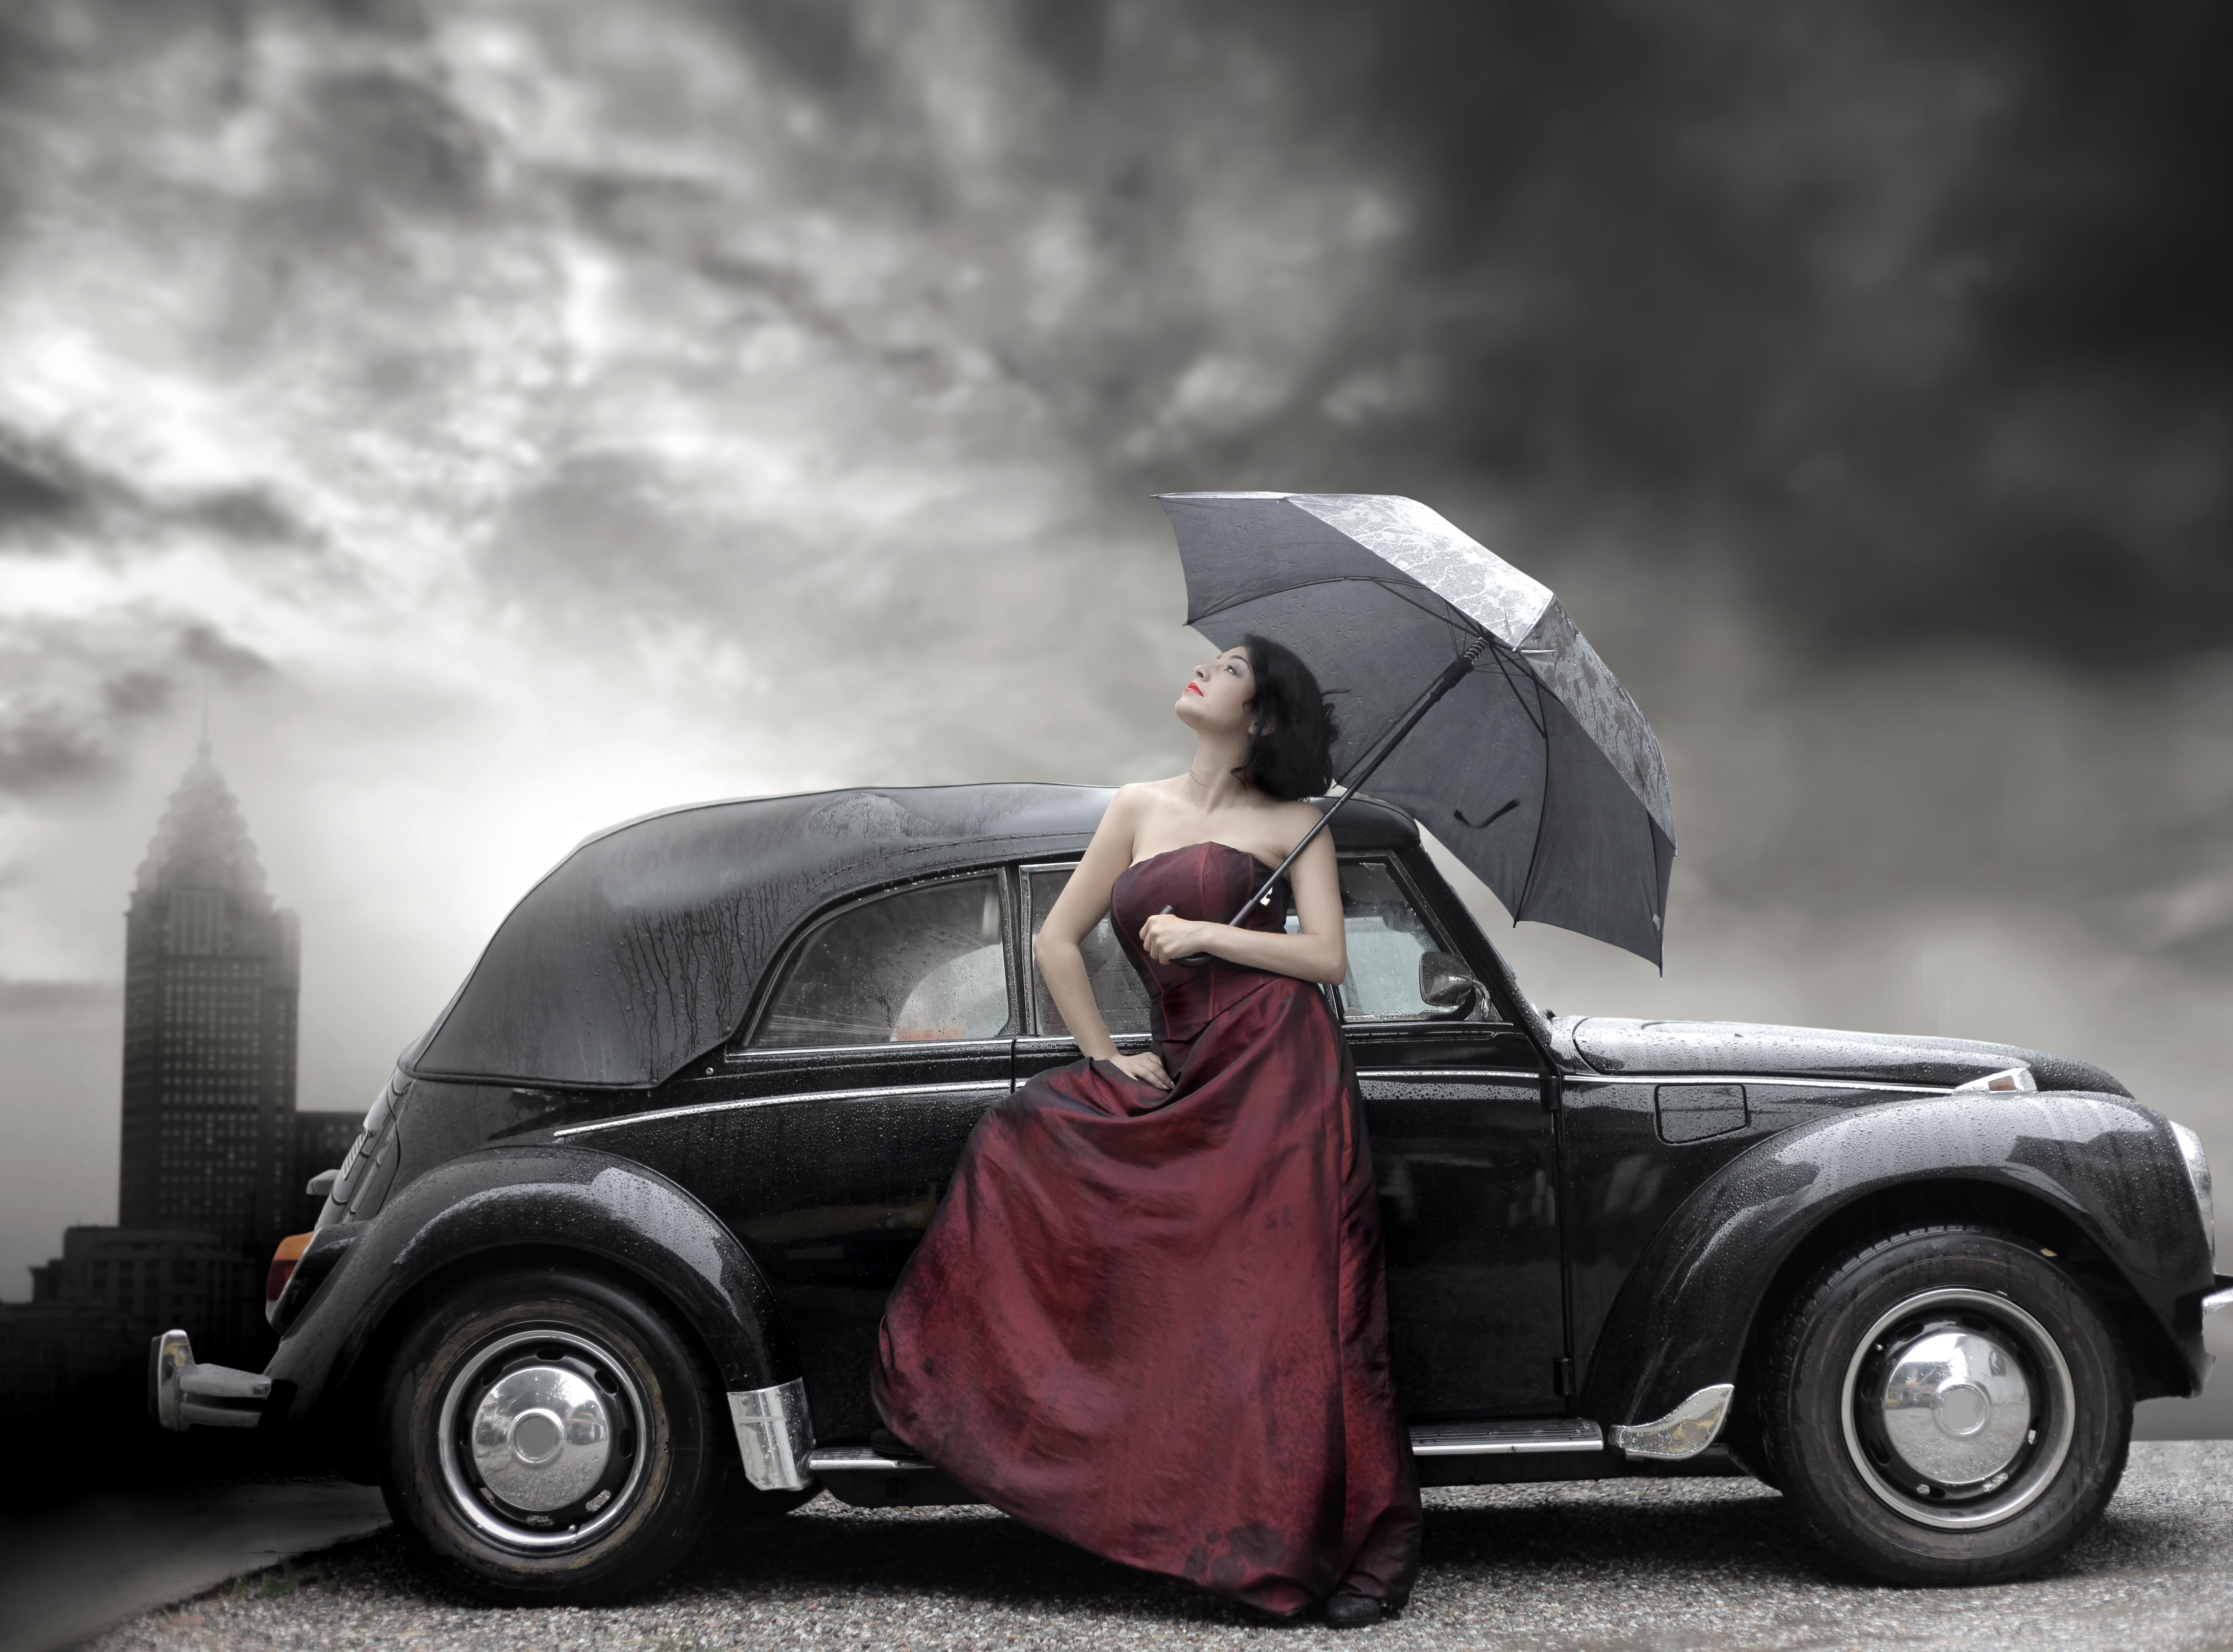 femmes voitures 5k retina ultra hd fond d 39 cran and arri re plan 5886x4355 id 266009. Black Bedroom Furniture Sets. Home Design Ideas